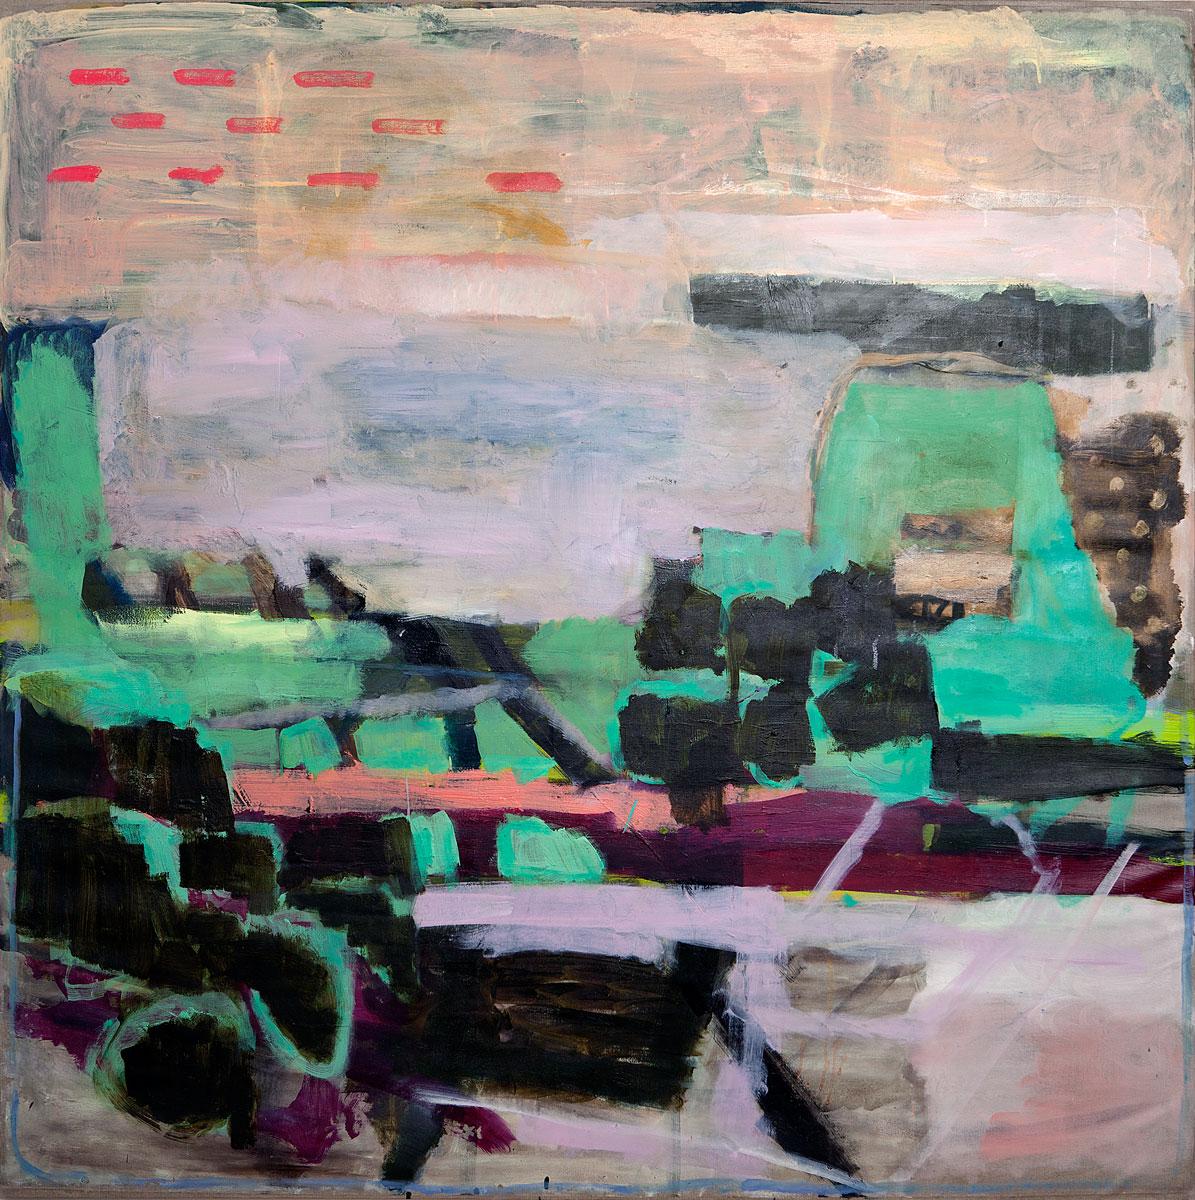 Gooseberry Gardens | oil on canvas | 152 x 152cm | 2013